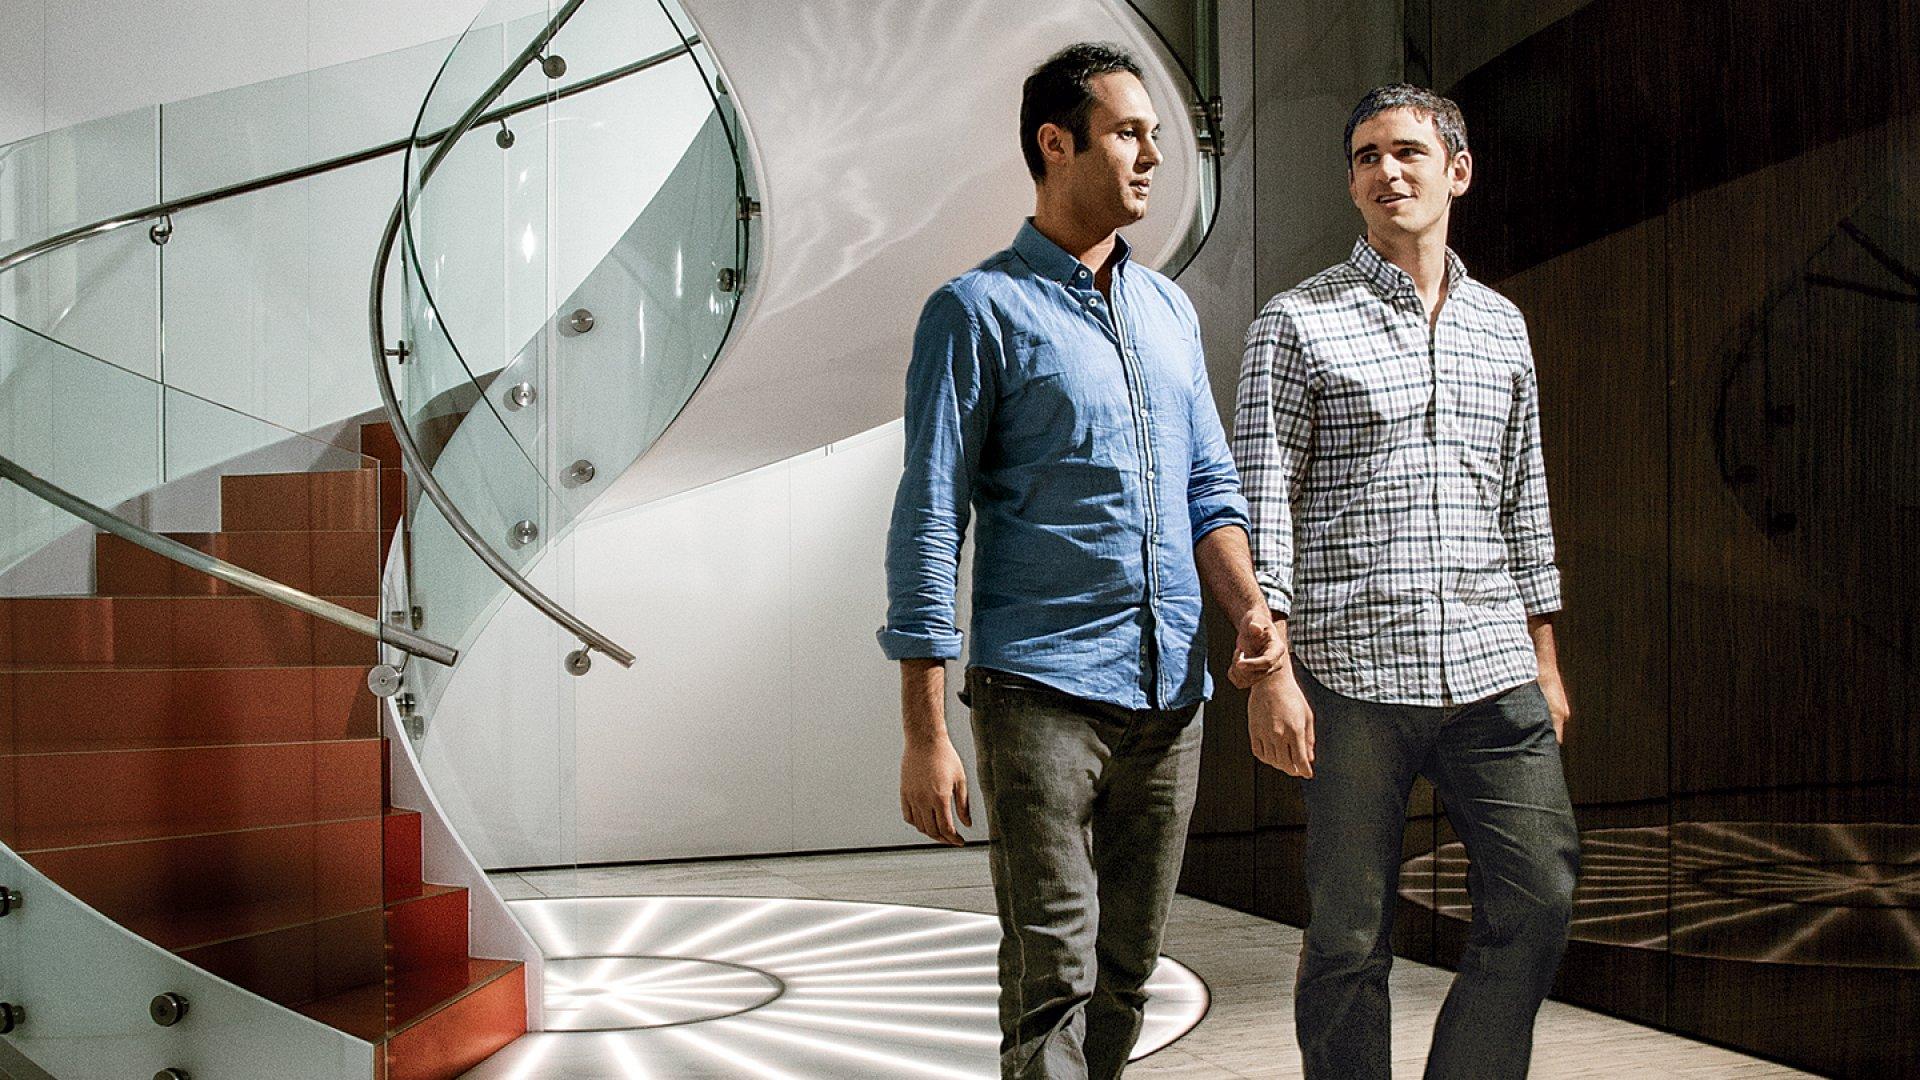 SeatGeek founders Russell D'Souza and Jack Groetzinger